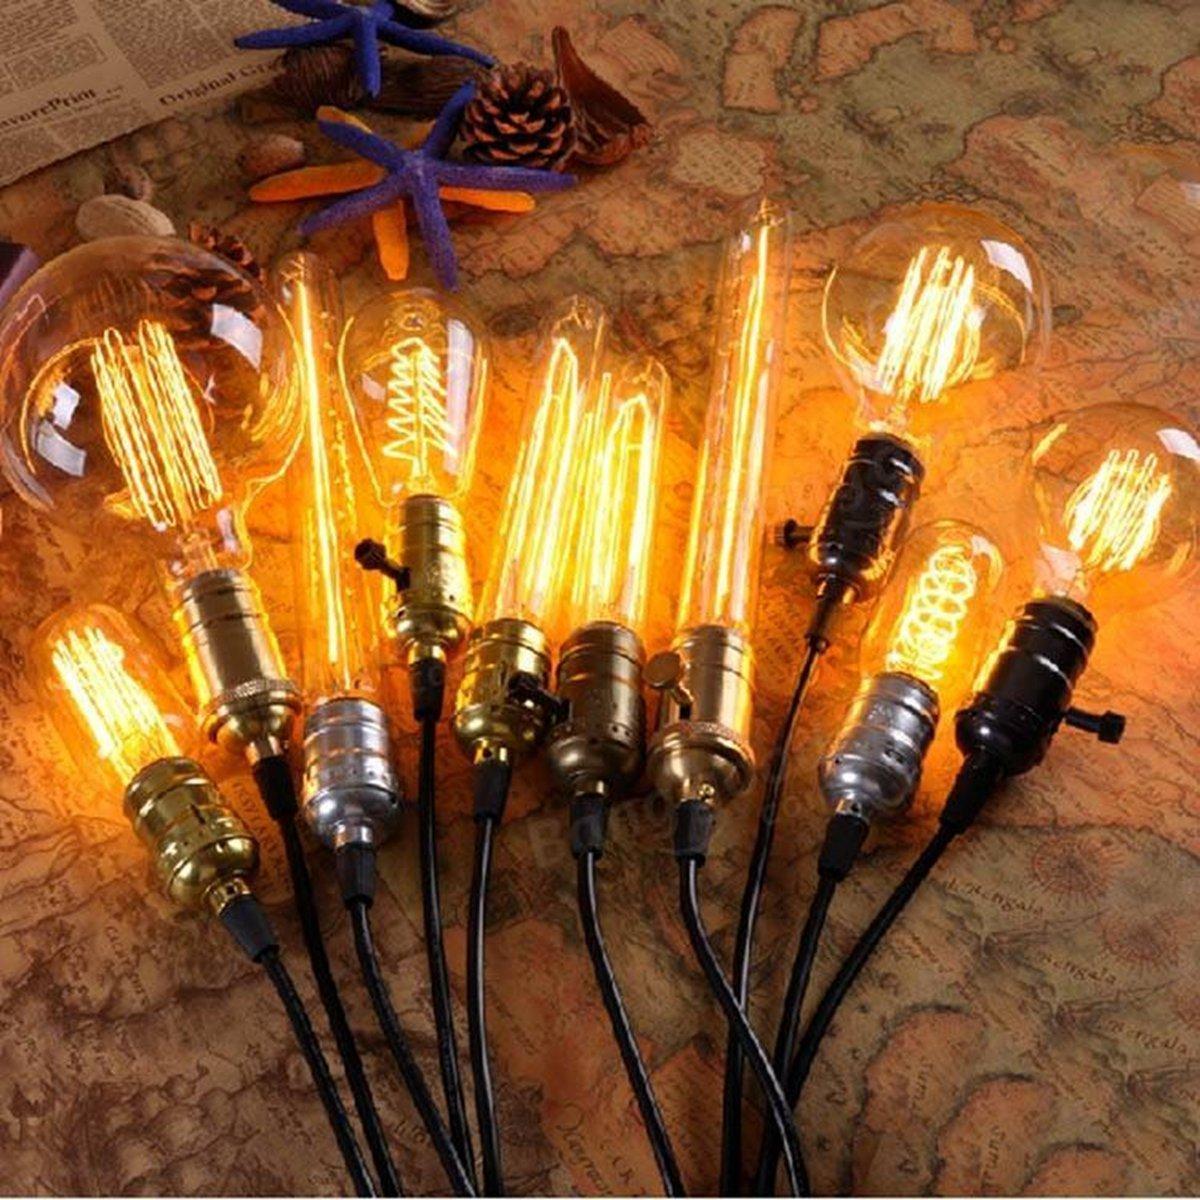 SooFoo T45 Edison Tubular Style Bulb , Vintage Antique Light Bulb ,E27 E26 Base ,110-130V 40W ,Warm white , Tubular Clear Glass, Filament Bulb For Home Light Fixtures Decorative, Dimmable (4 Pack)